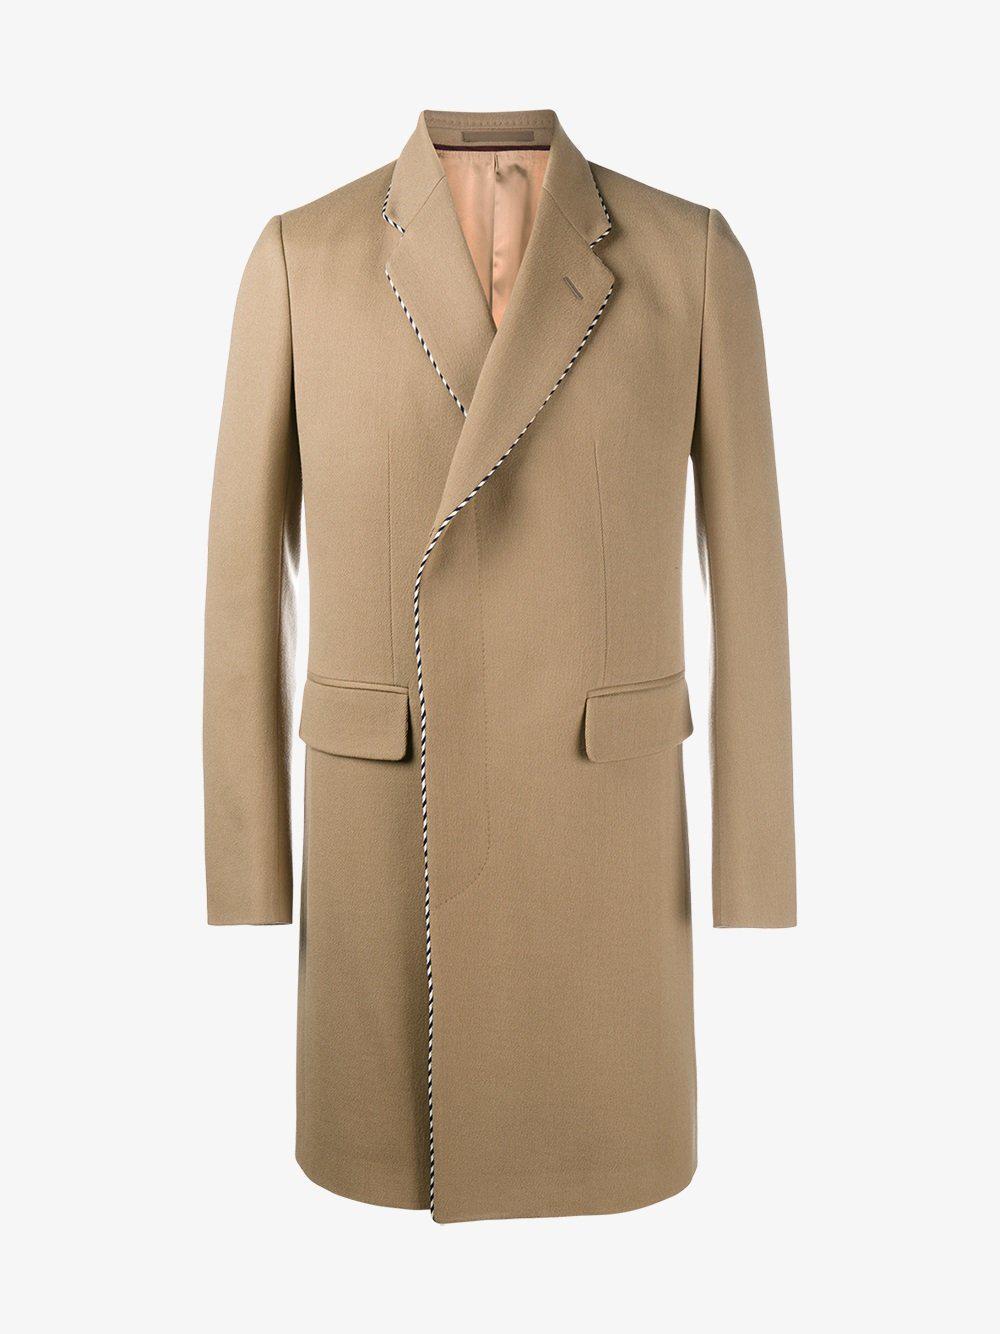 d059cc1f9 Gucci Mens Clothing Lyst | Toffee Art